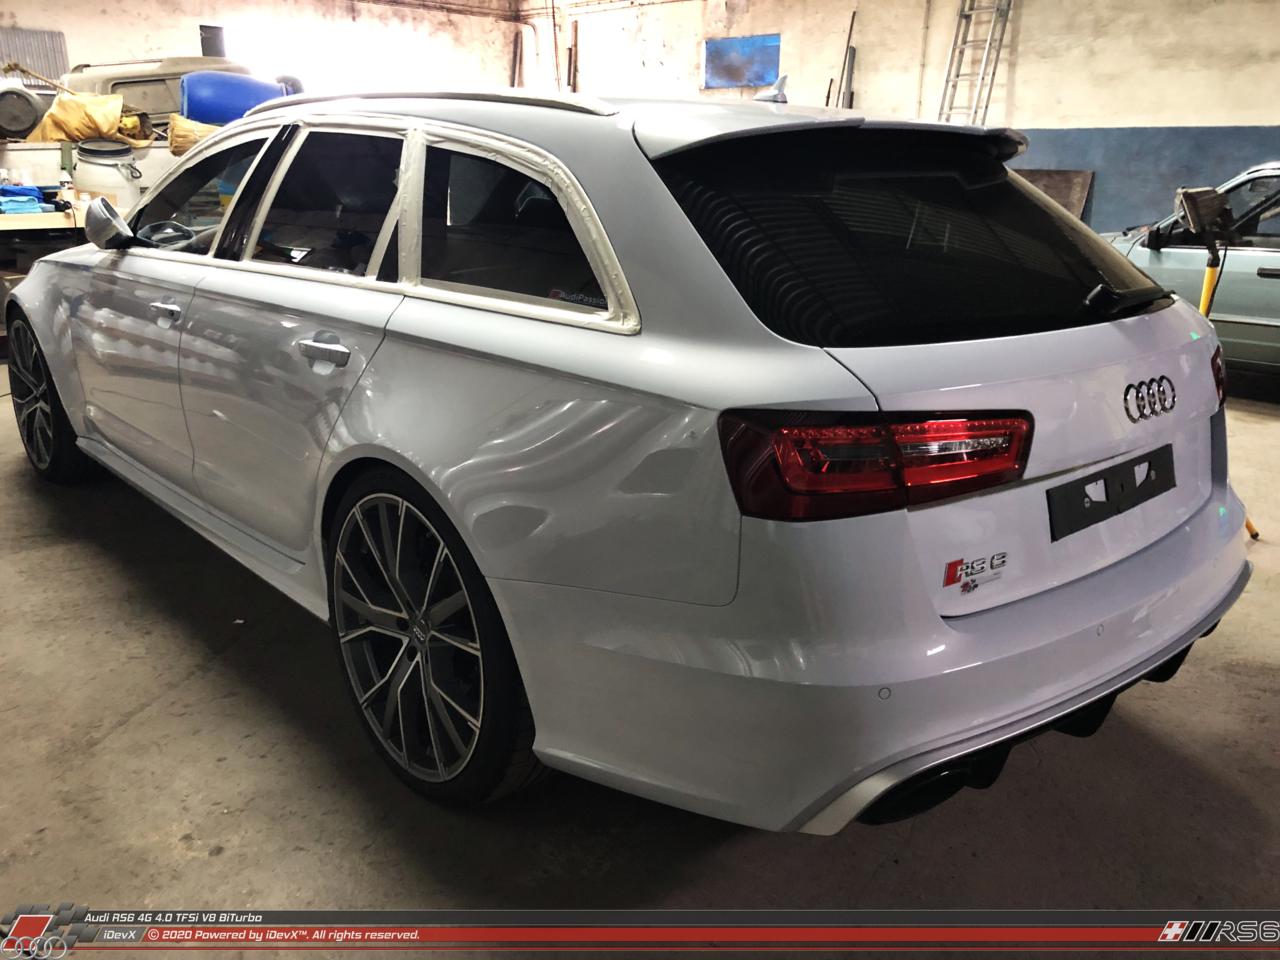 05_08.2019_Audi-RS6_iDevX_012.png